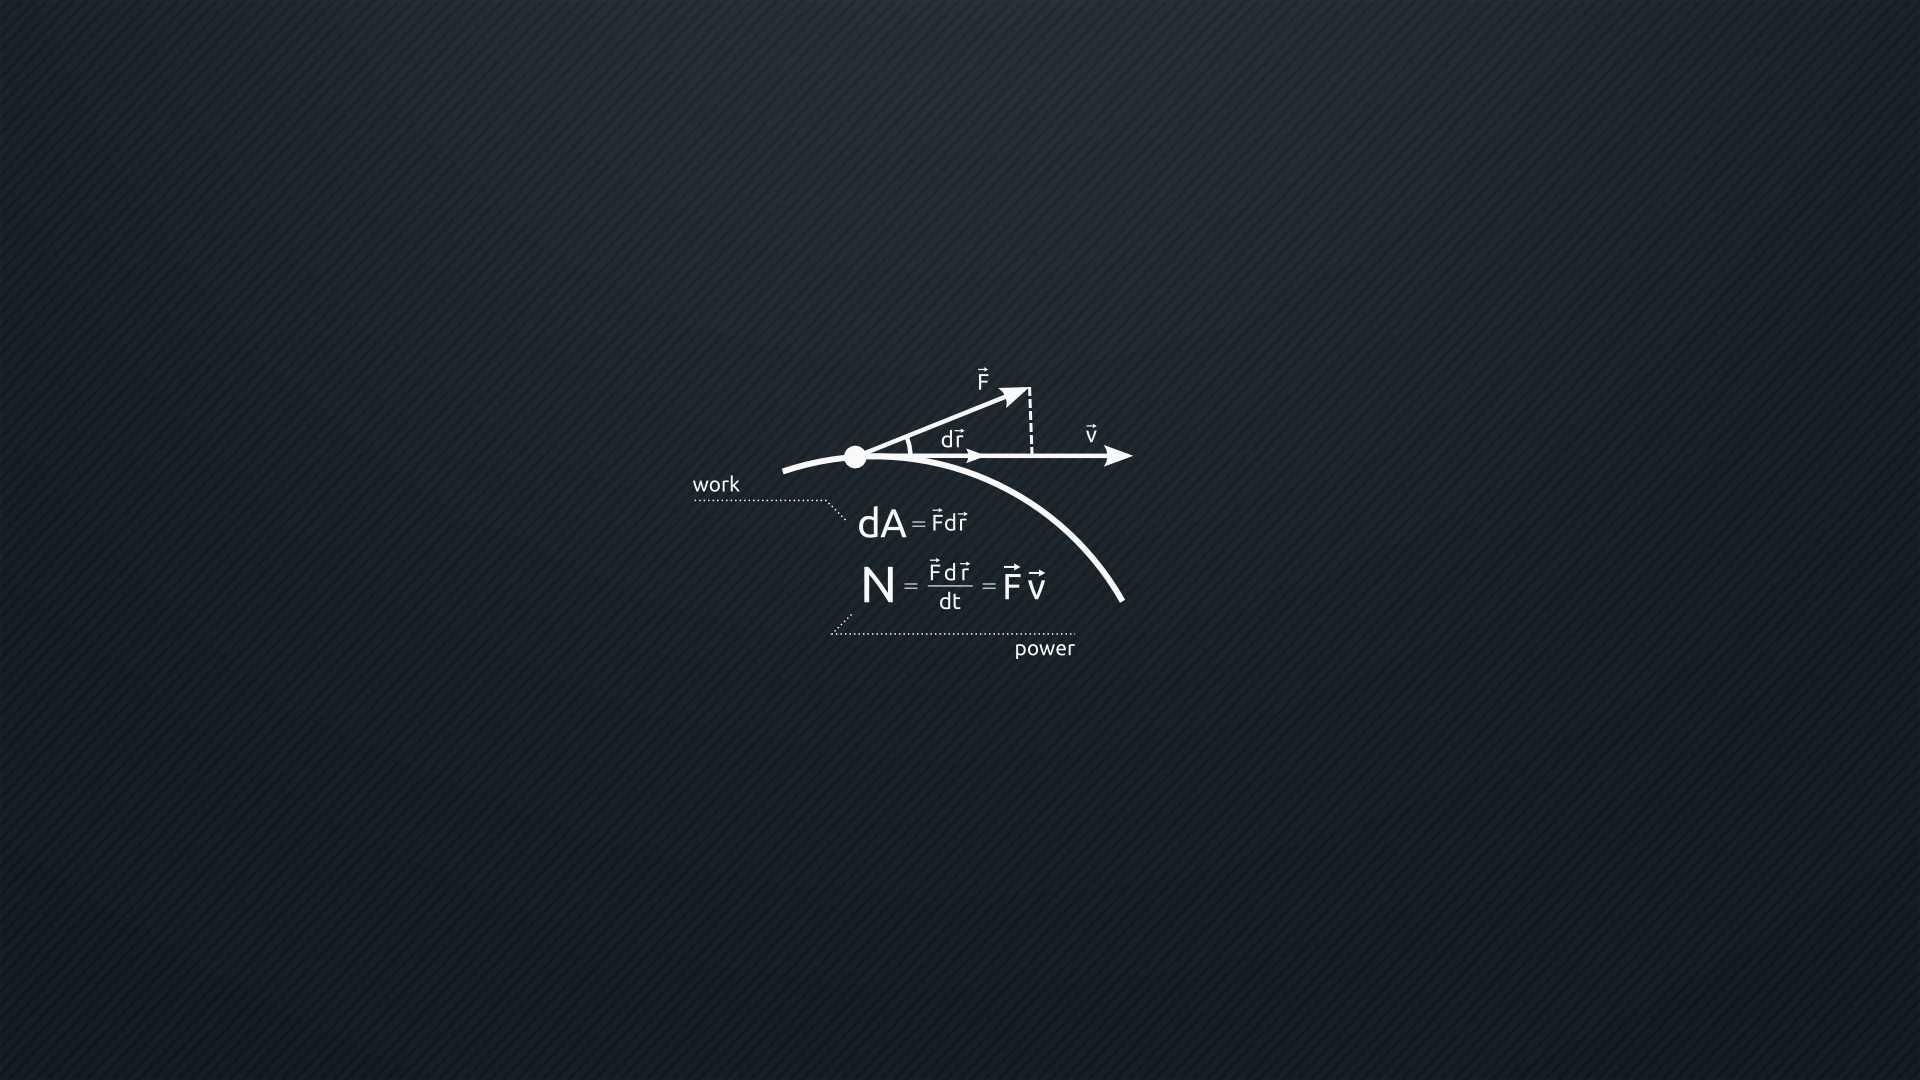 Iphone Wallpaper Physics – 1895574